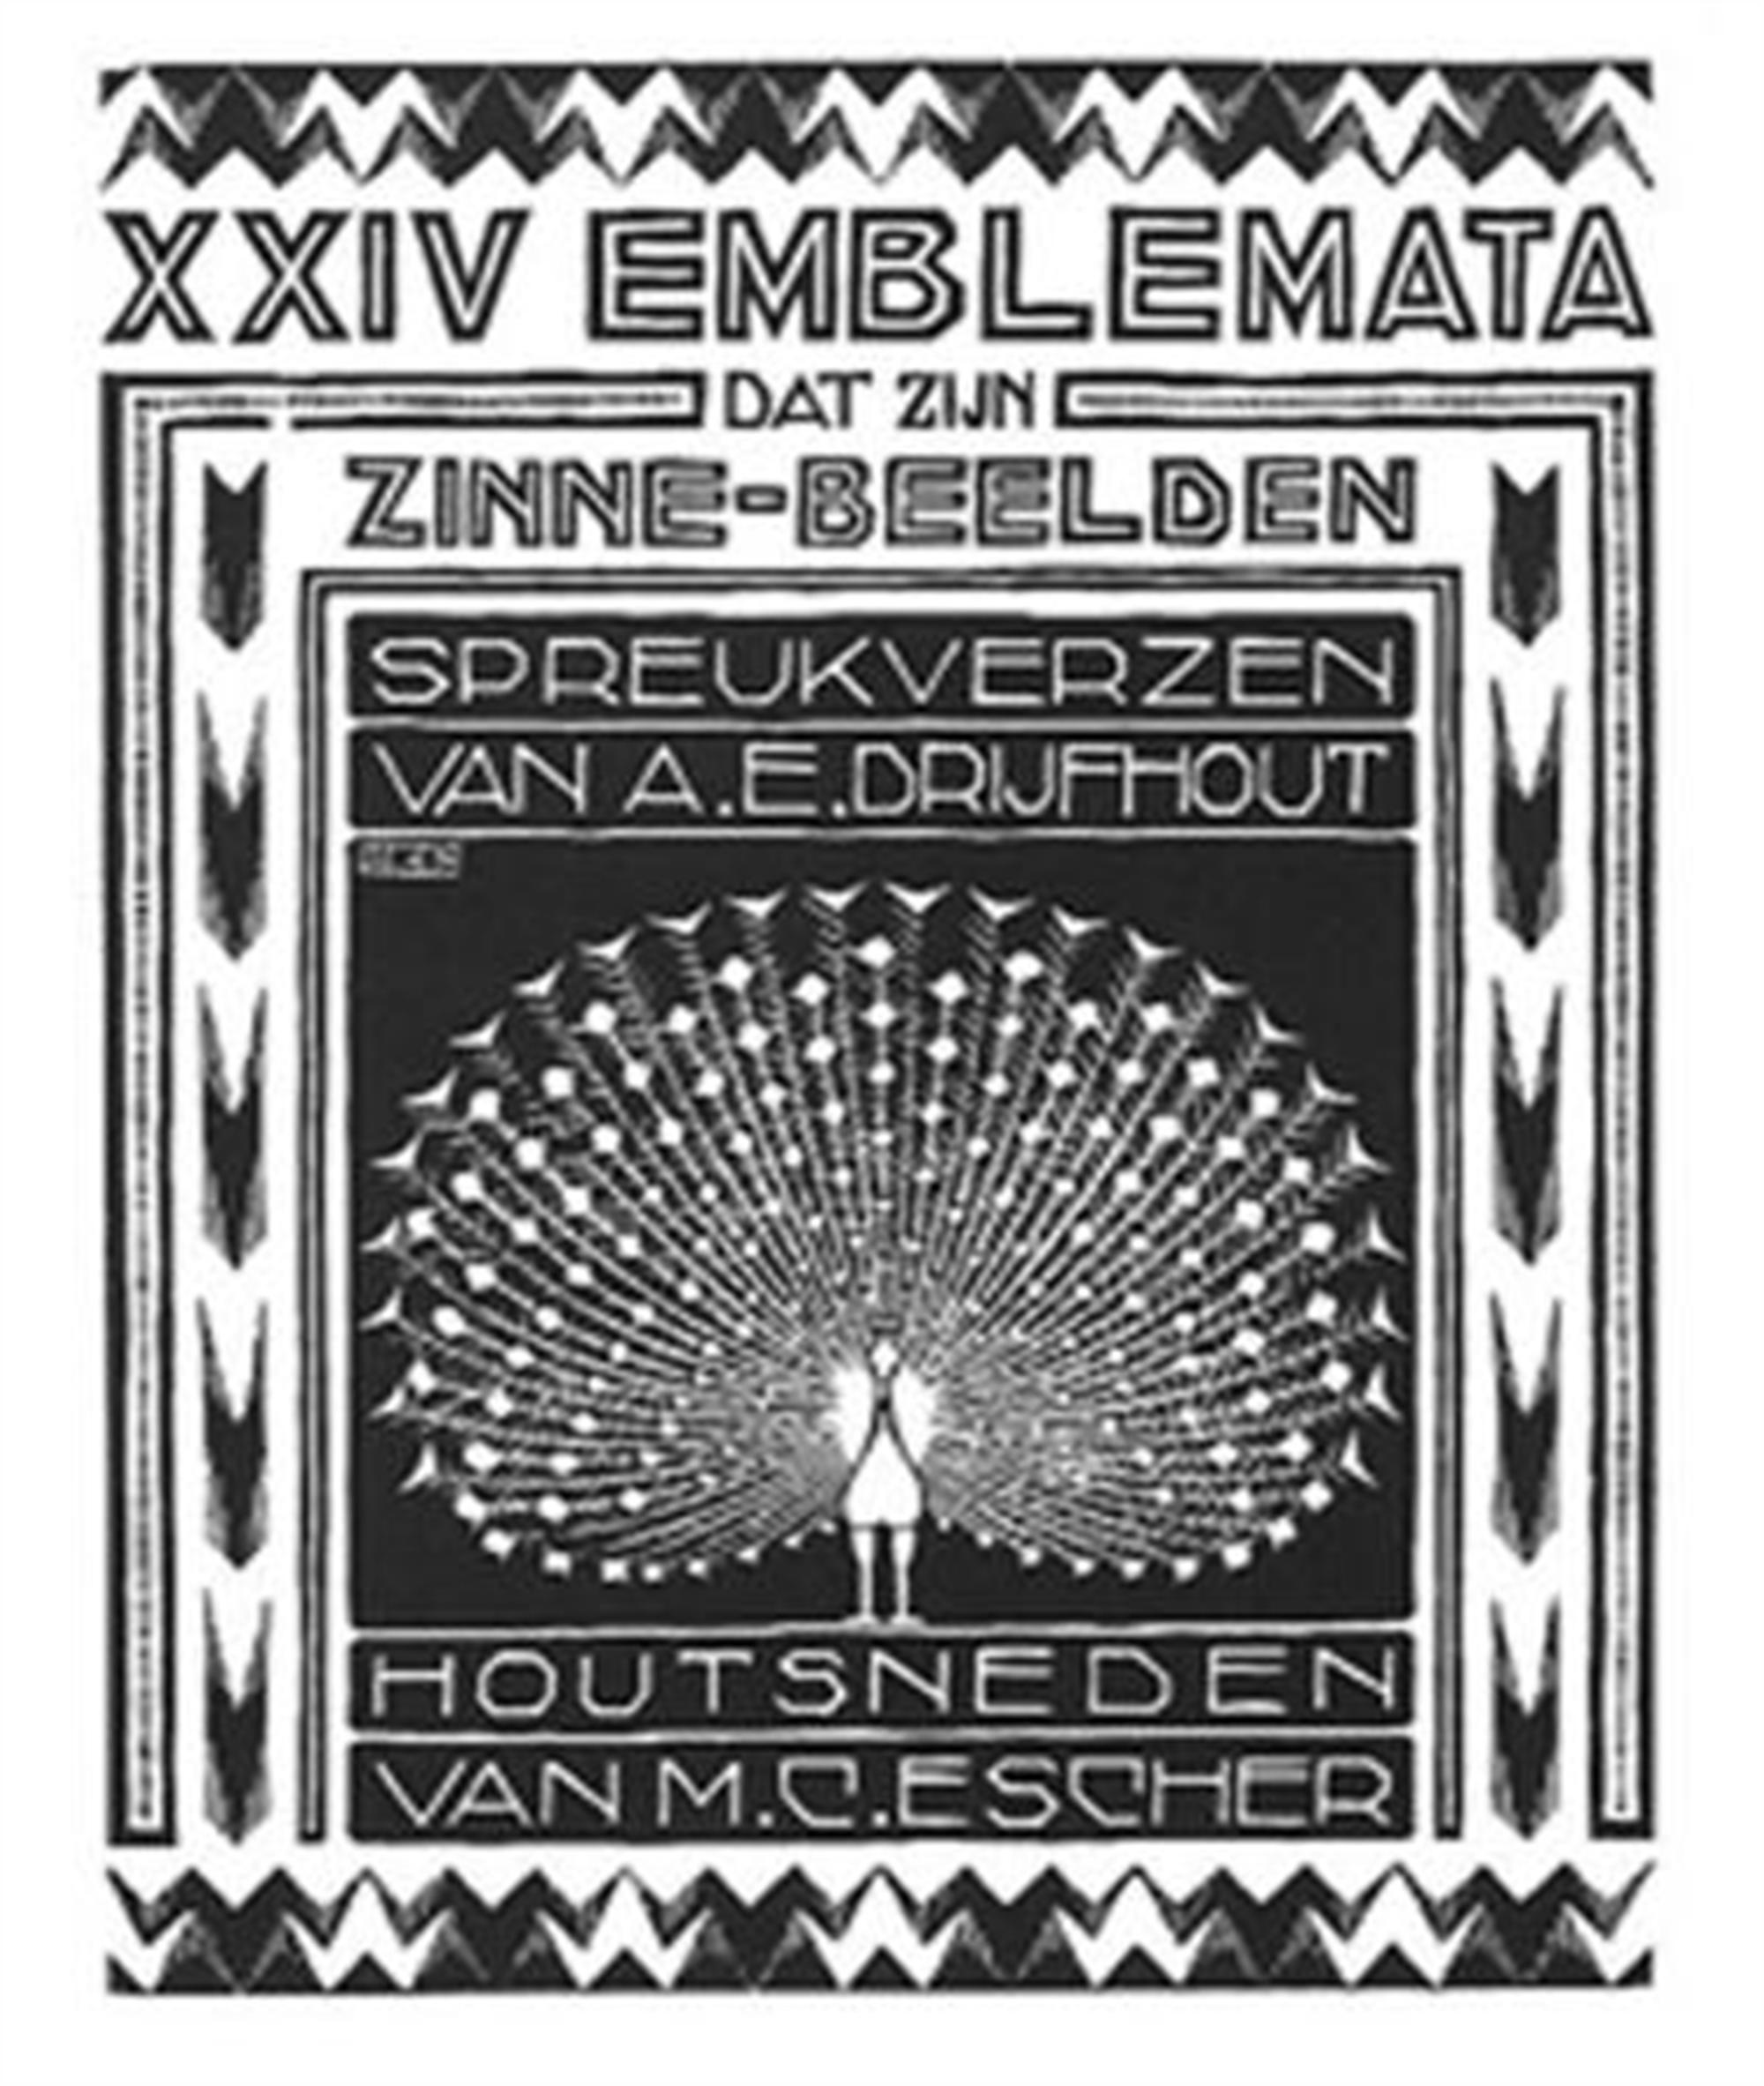 Emblemata - Second Title Page by M.C. Escher